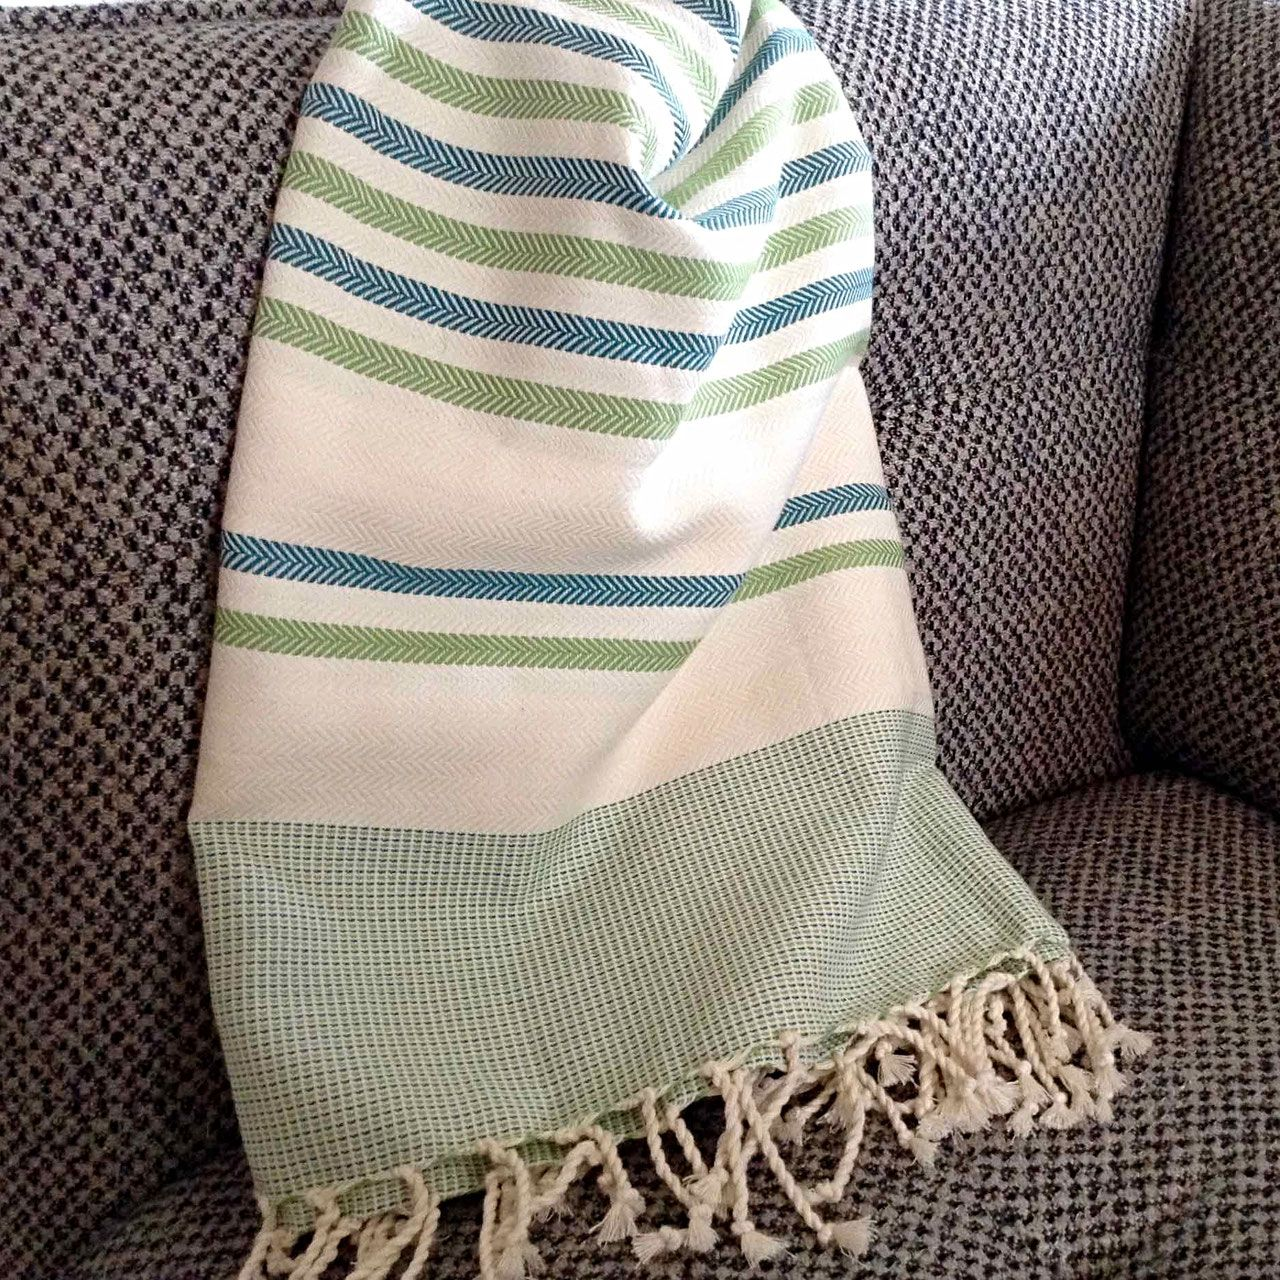 Fouta Tunisienne De Plage Chevron Adgart Turkish Cotton Towels Fouta Towels Beach Towel